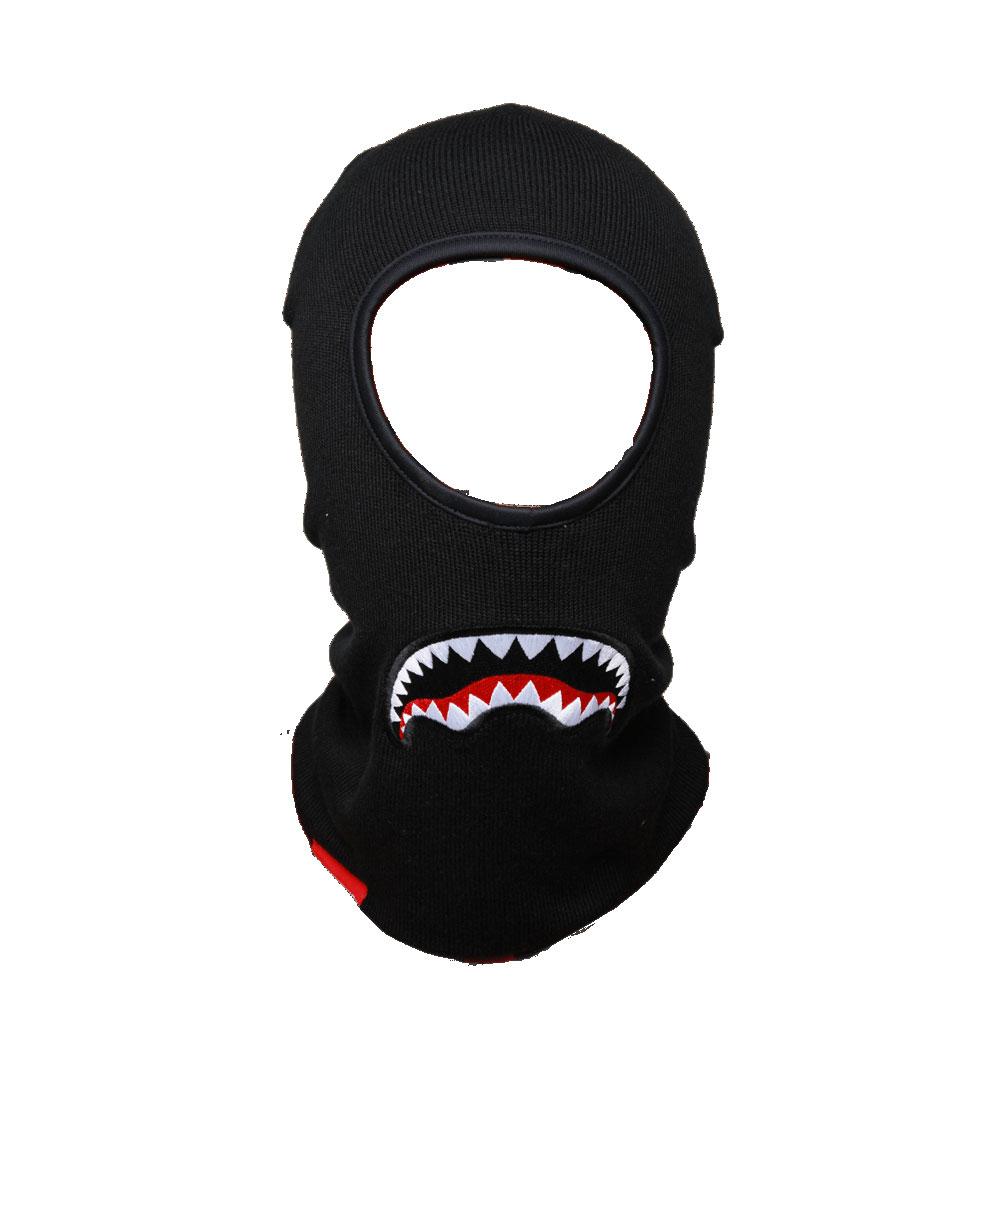 Herren Balaklava Sharkmouth Black